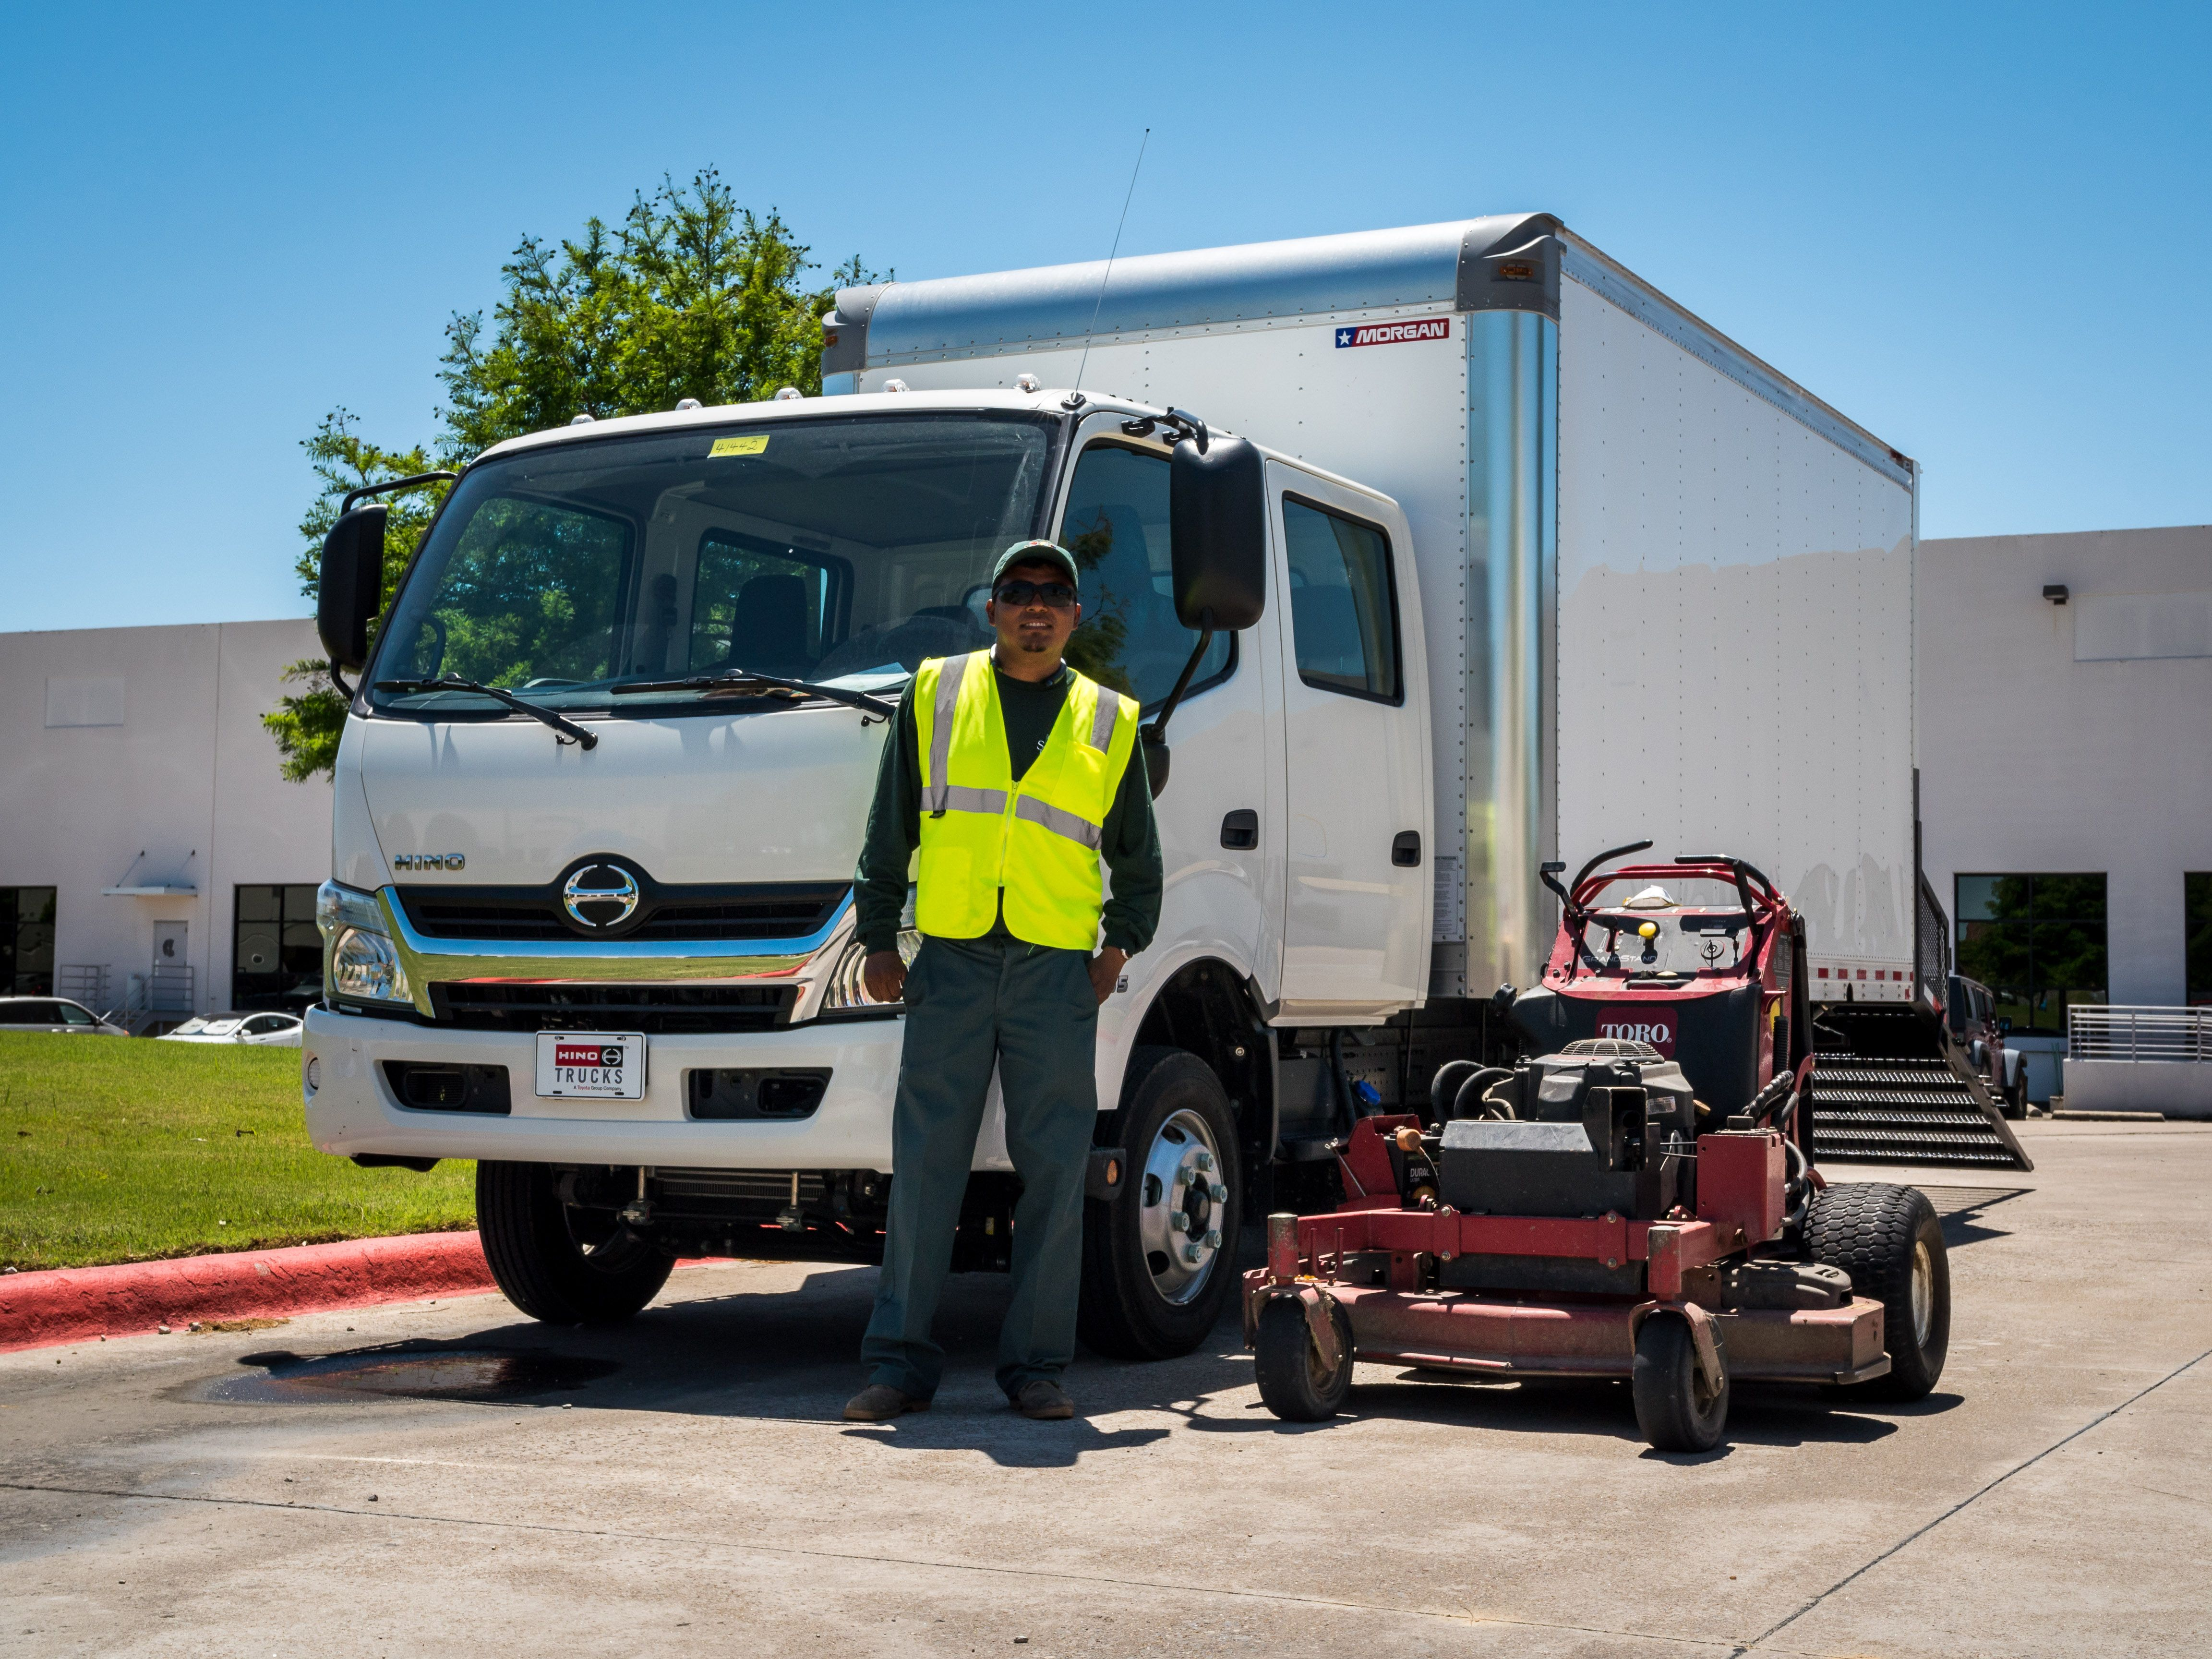 Custom Hino 155dc Landscape Truck Ideas Landscaping Contracting Landscapedesign Trucks Landscaping Equipment Used Trucks Trucks